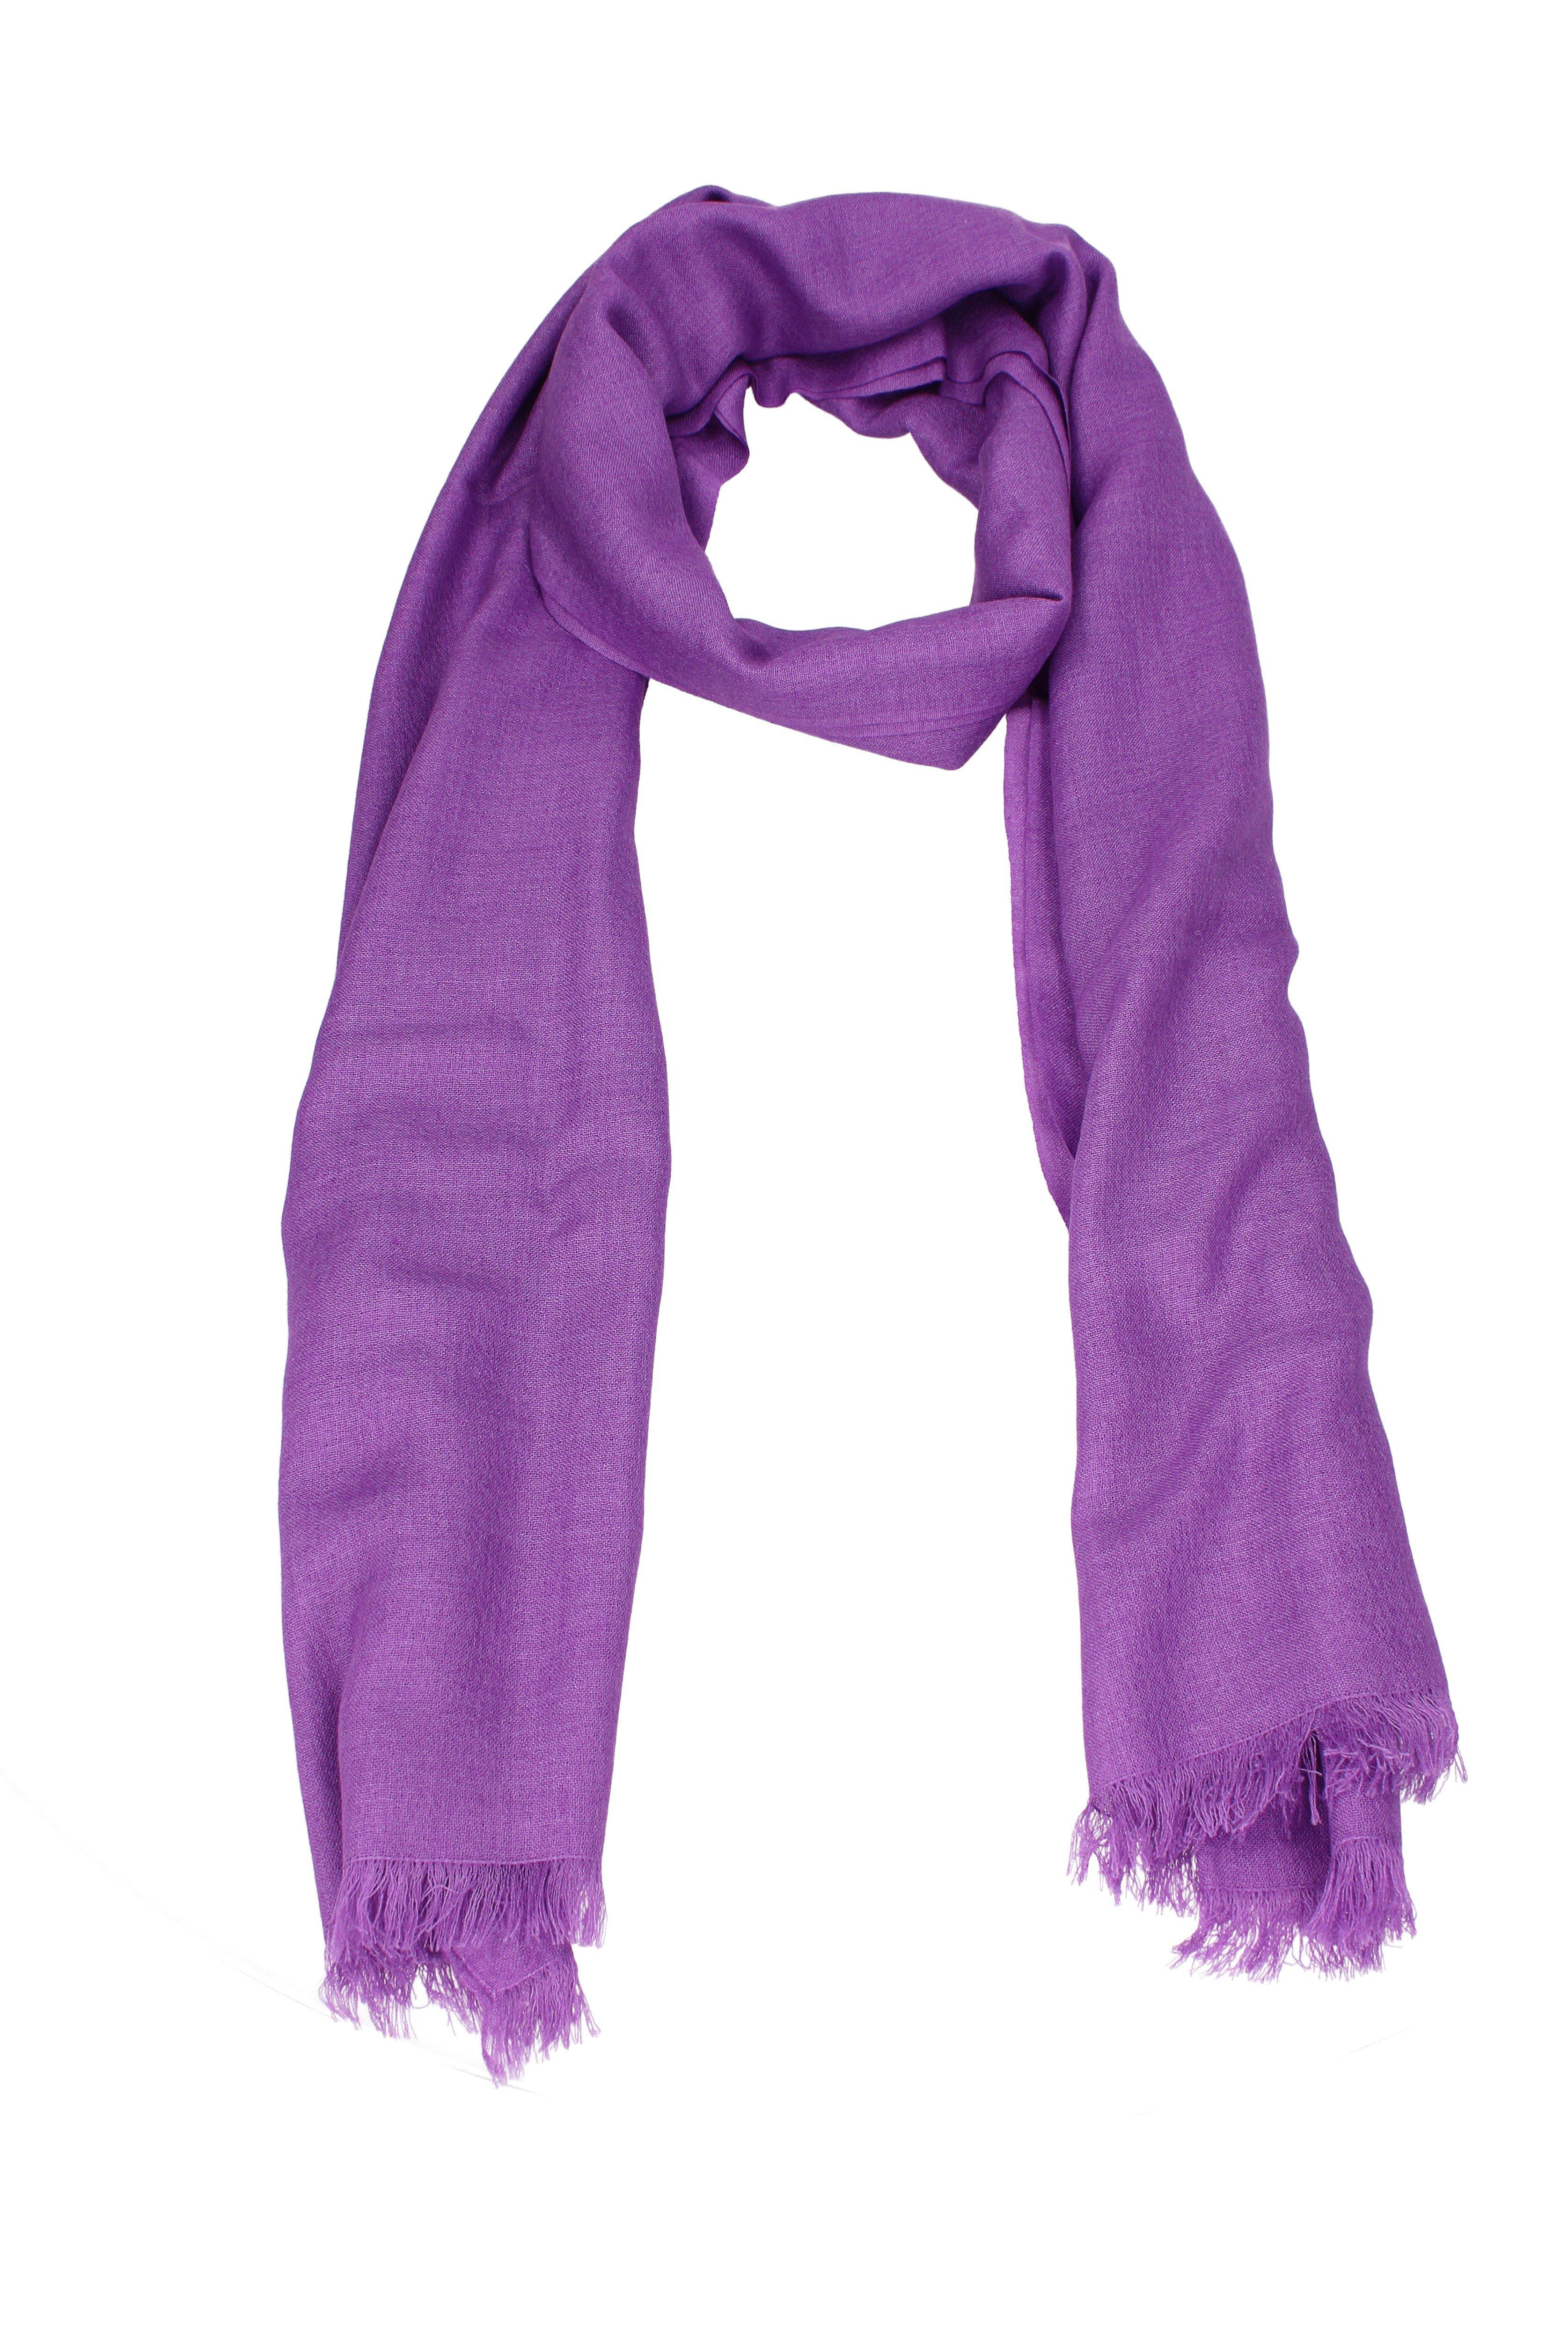 info for 9070b 84523 Cruciani Purple Foulard Women Violet